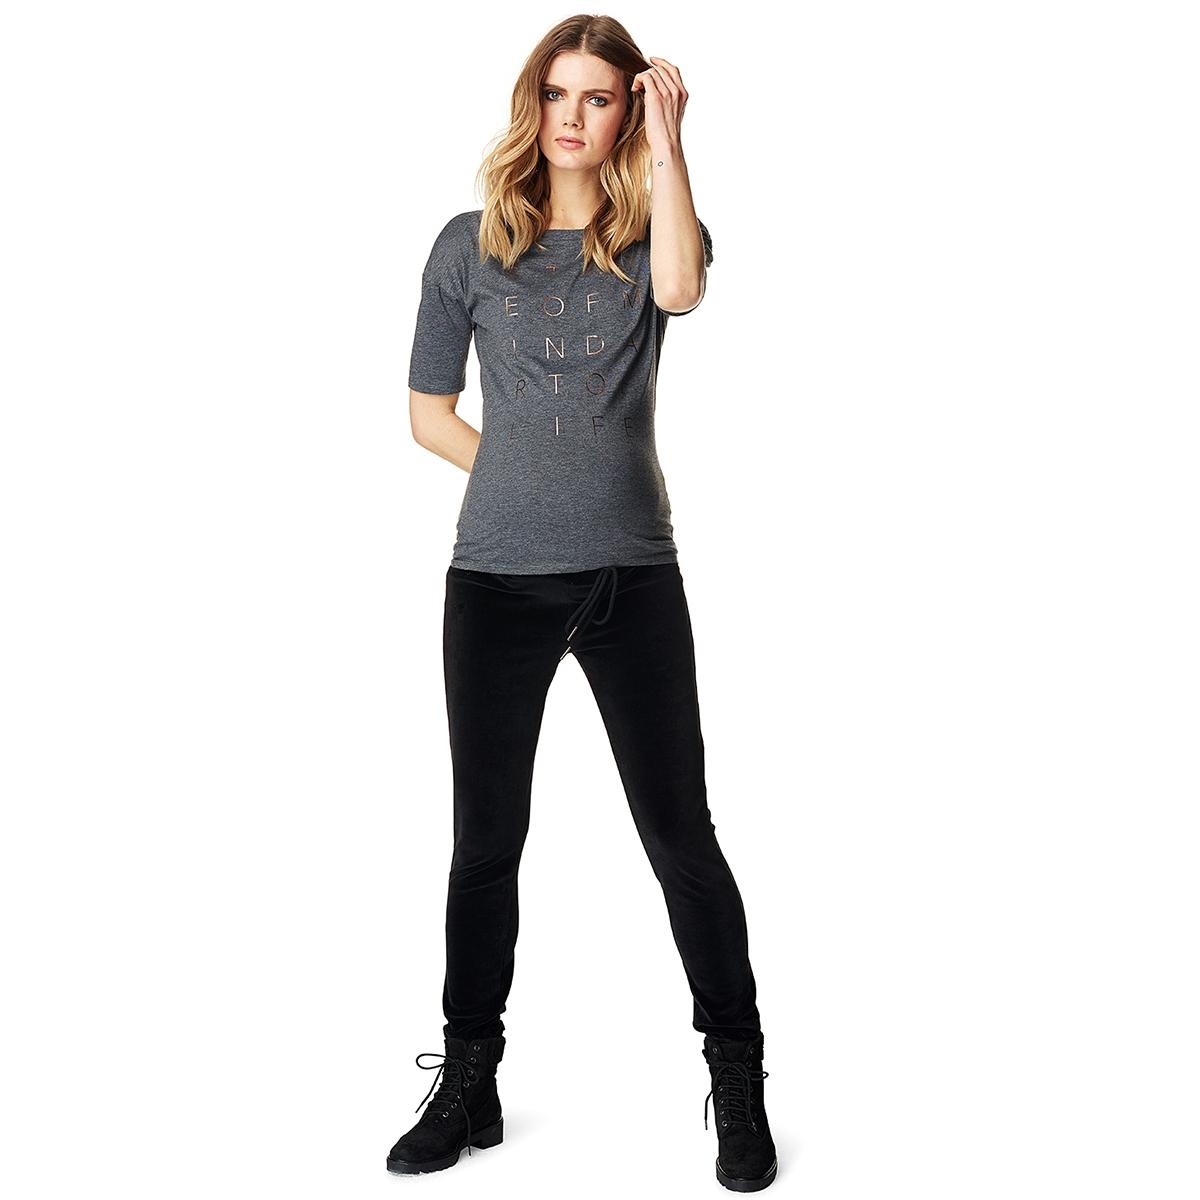 s0651 tee print supermom positie shirt antracite